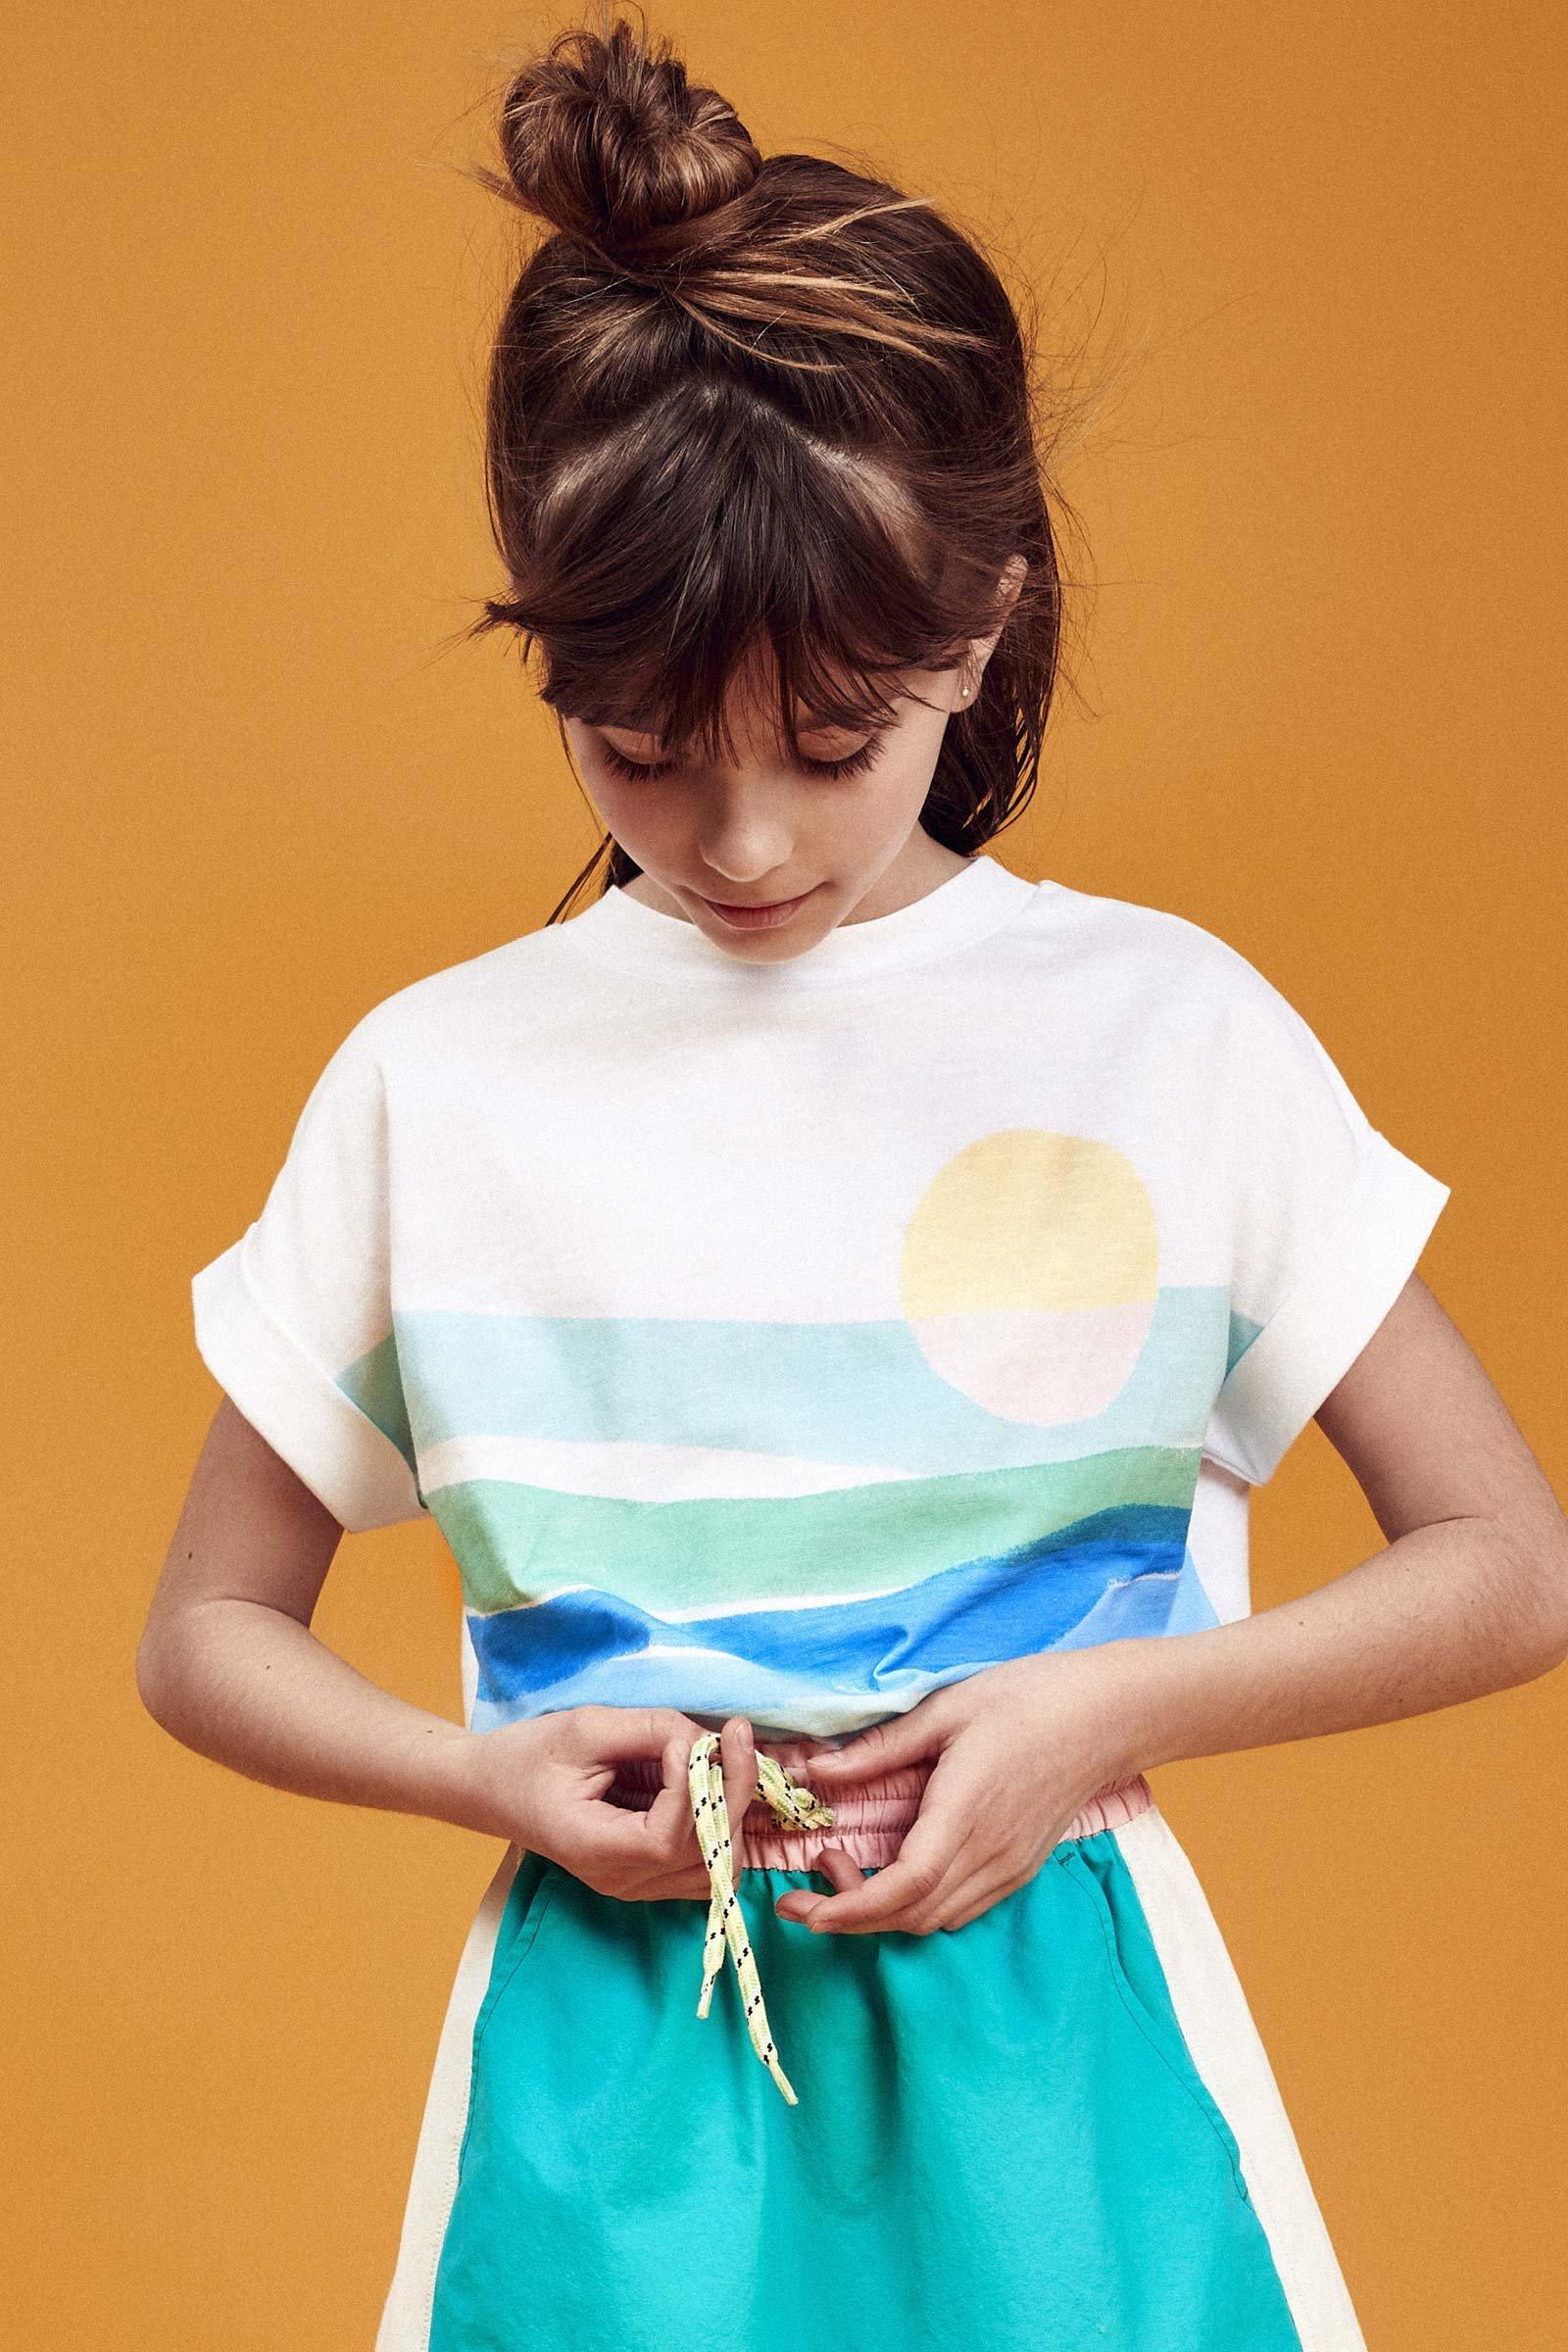 CKS Kids - INAR - t-shirt korte mouwen - wit